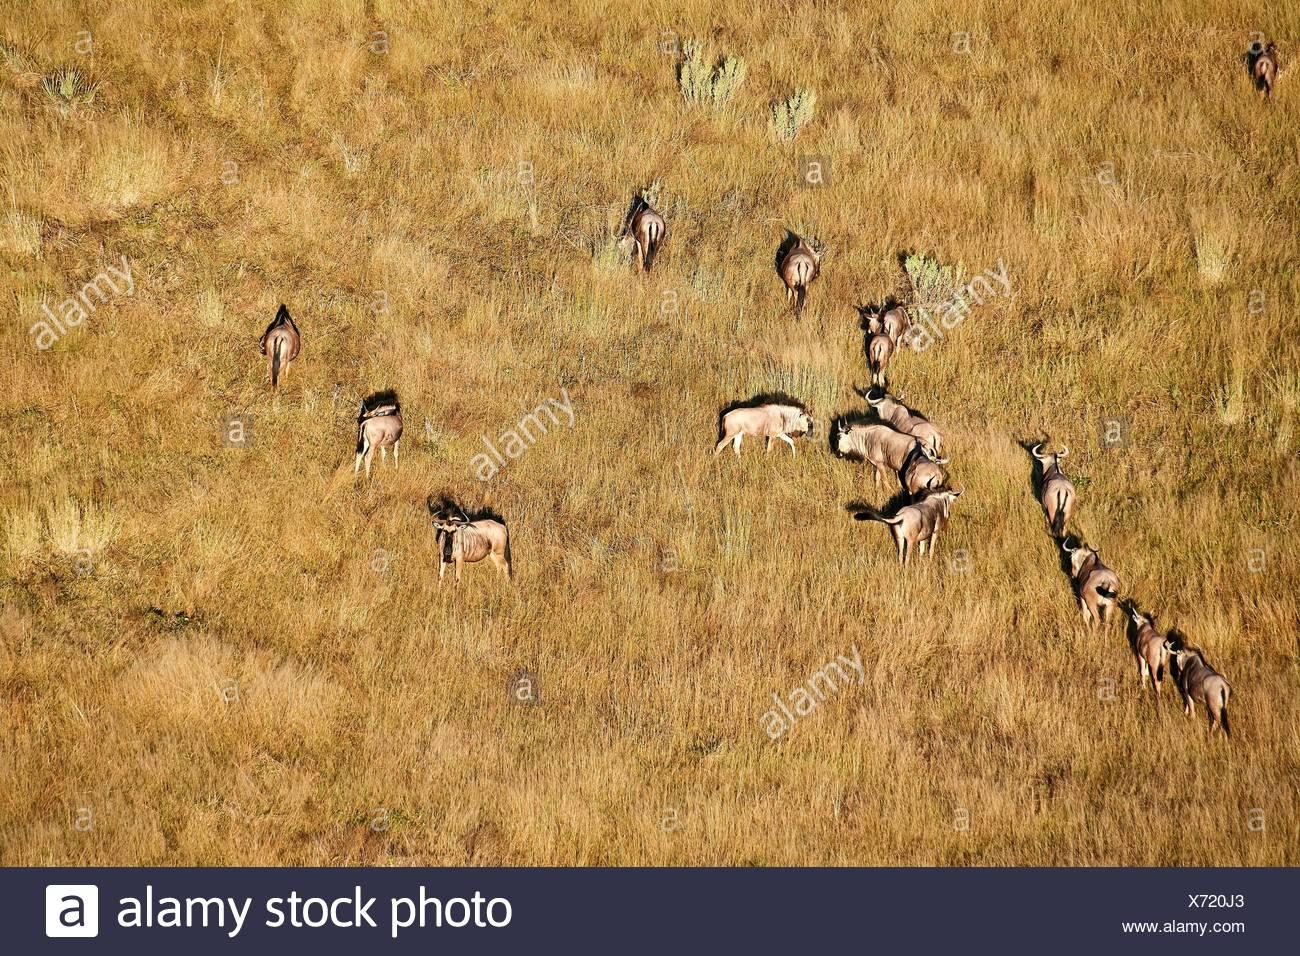 Aerial view of blue wildebeest herd grazing (Connochaetes taurinus), Okavango Delta, Botswana, Africa. - Stock Image